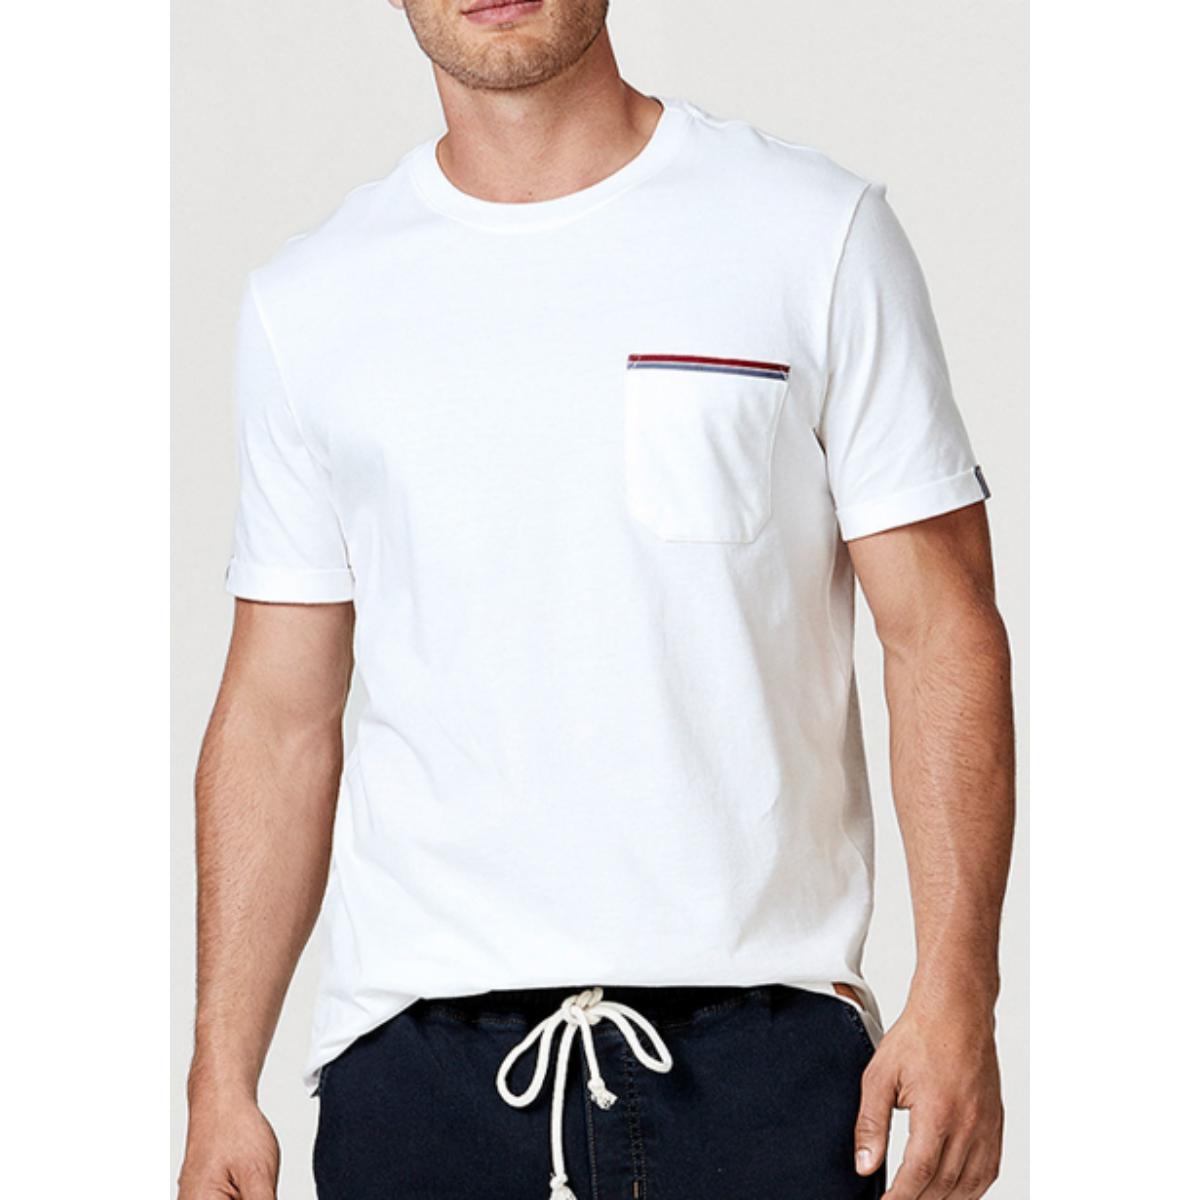 Camiseta Masculina Hering 4egx Nmcen Branco